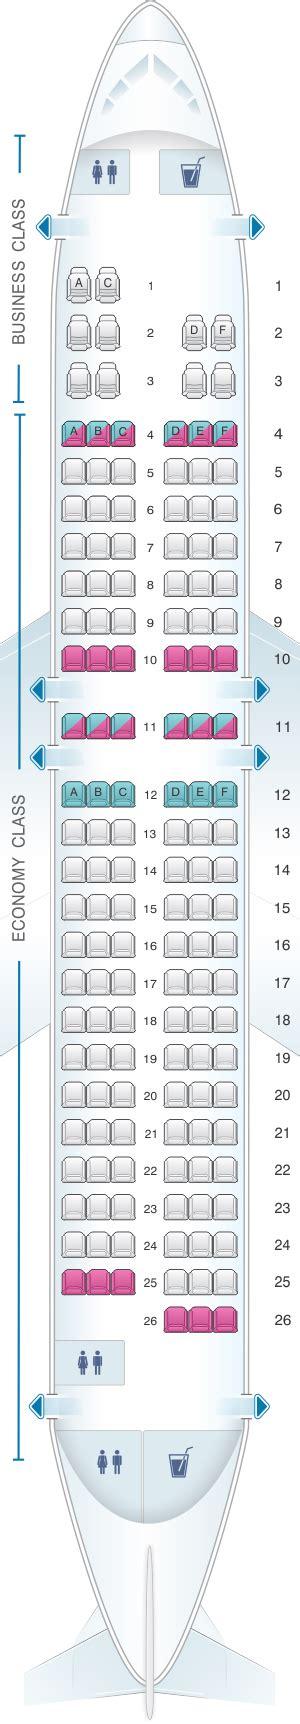 plan des sieges airbus a320 plan de cabine egyptair airbus a320 232 seatmaestro fr